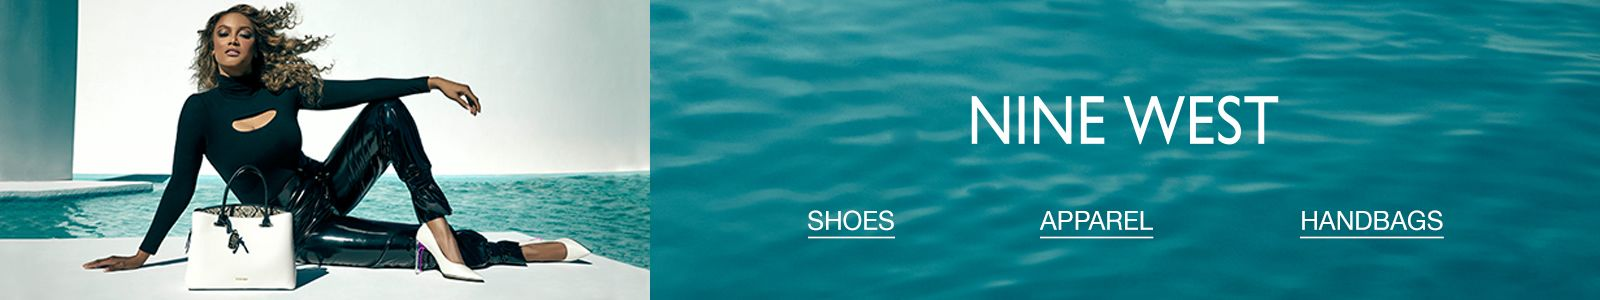 Nine West, Shoes, Apparel, Handbags